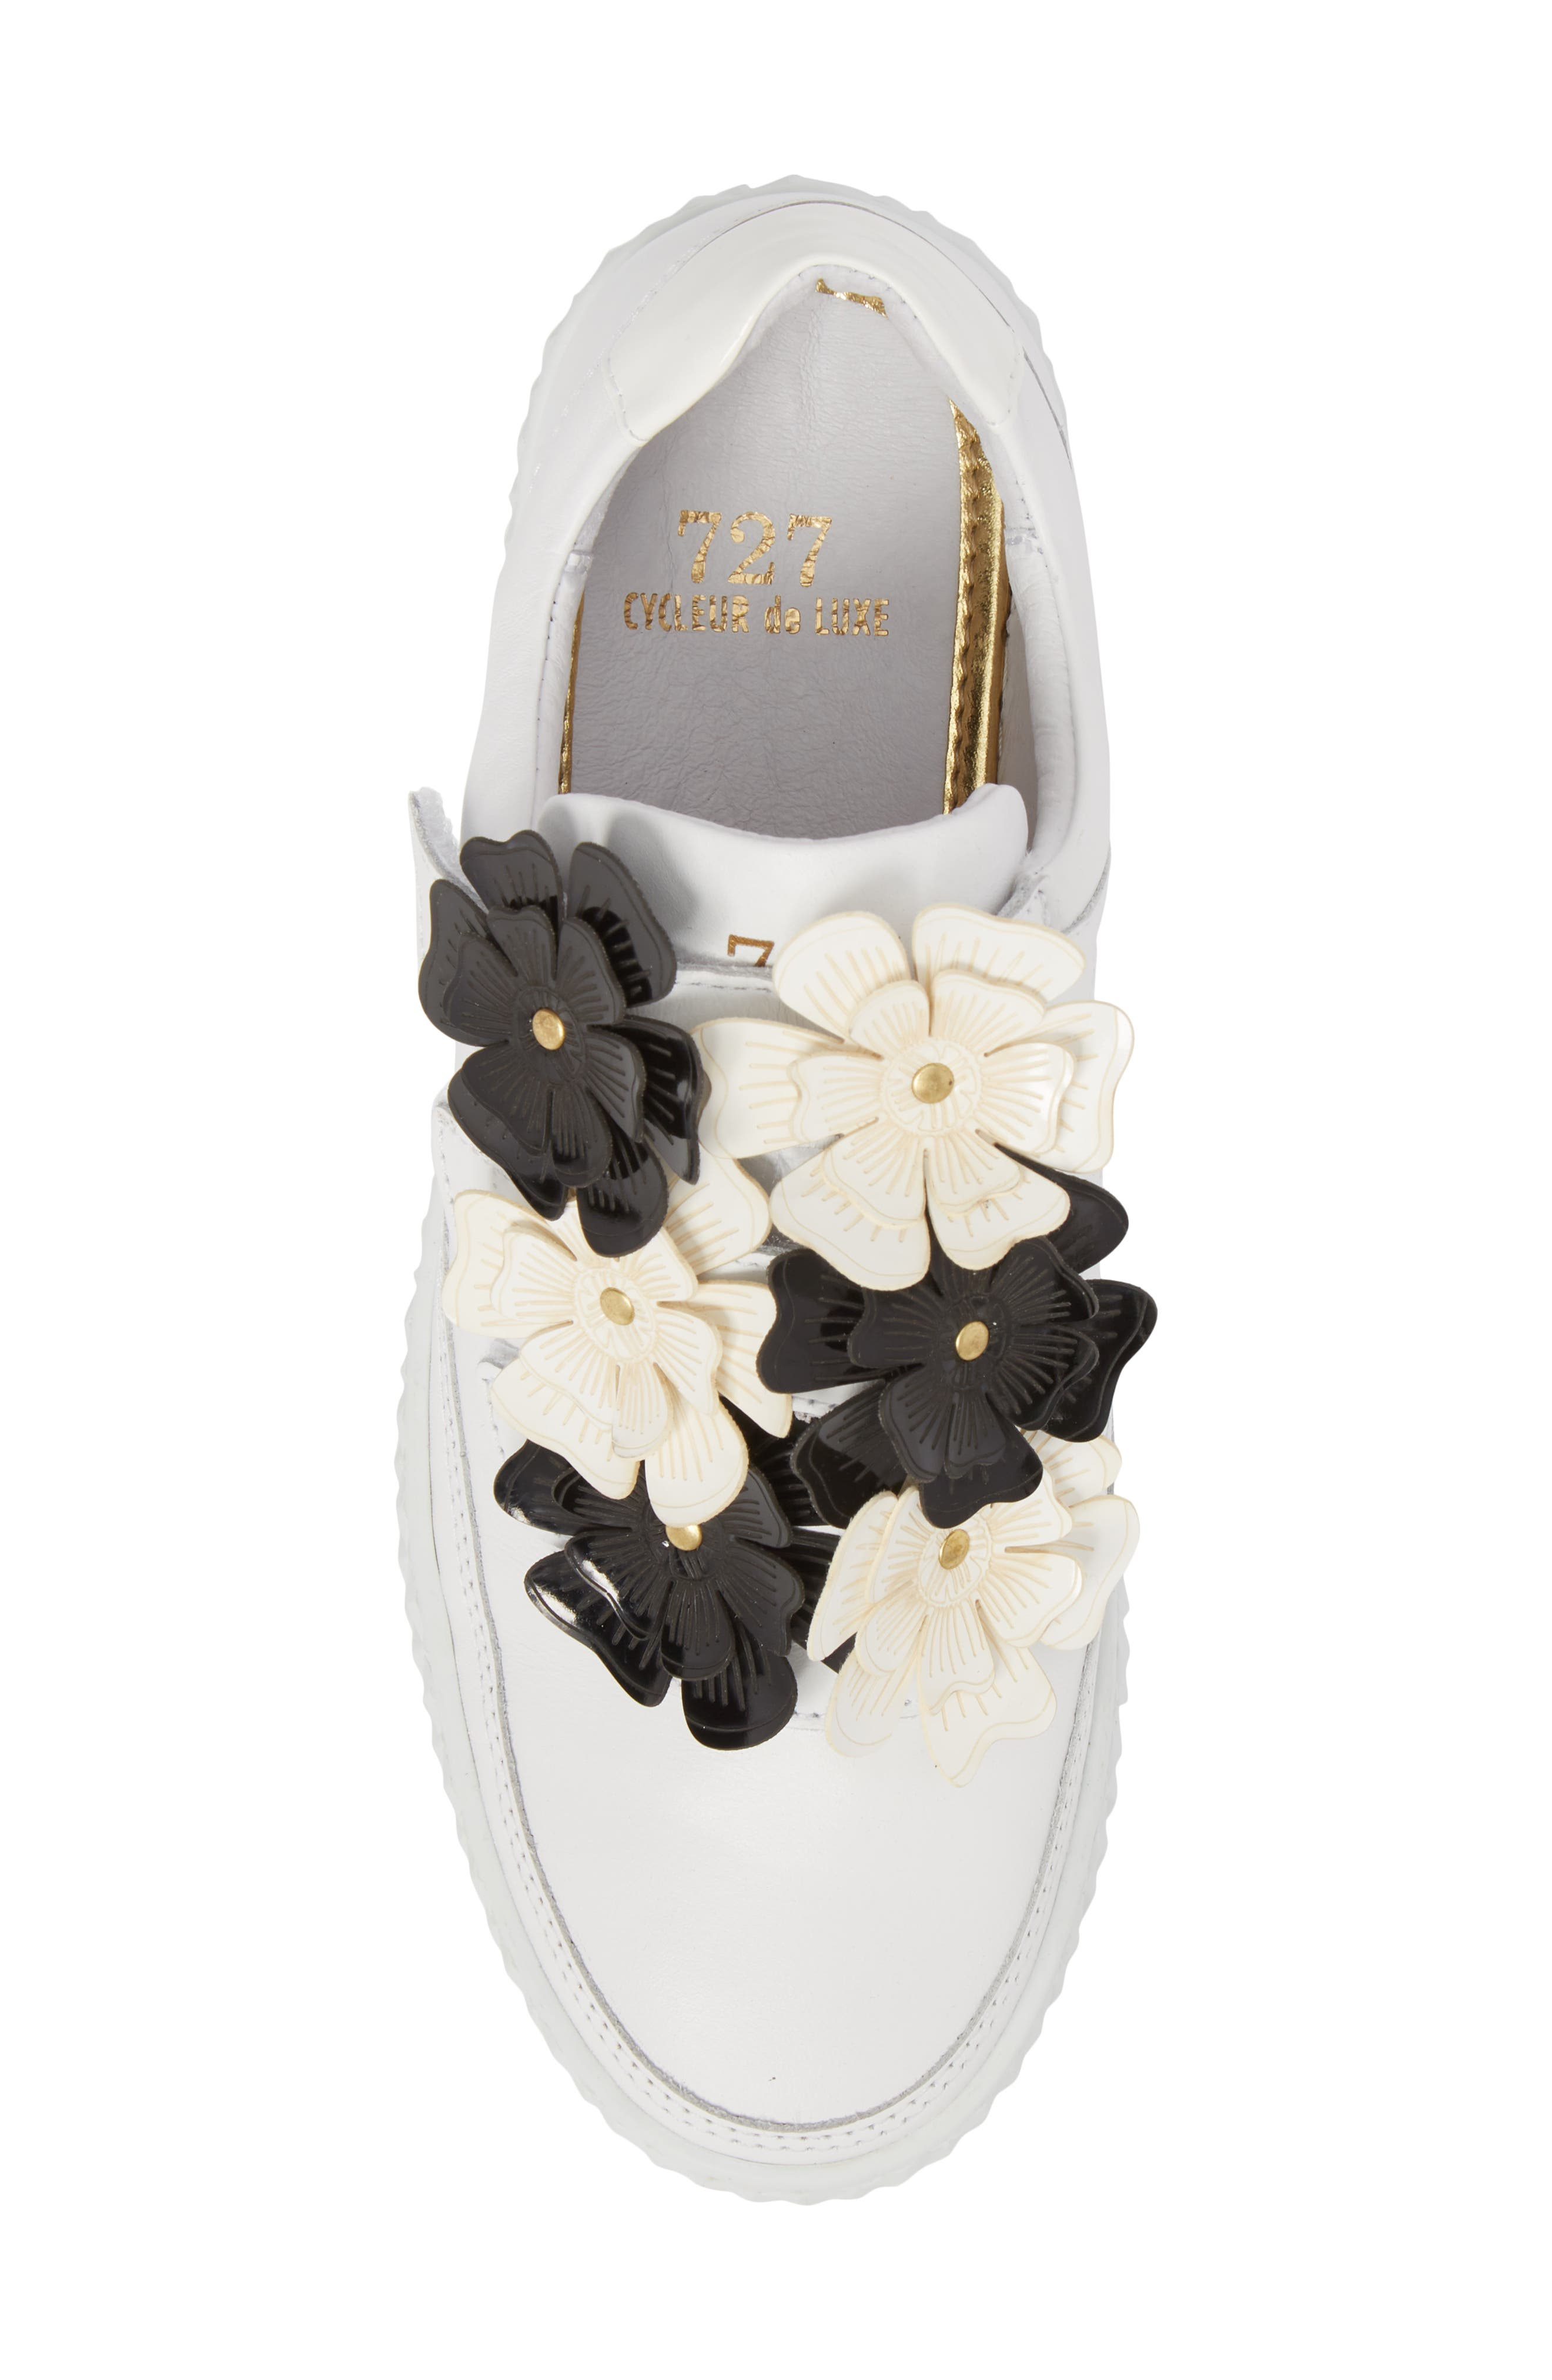 Hurou Embellished Sneaker,                             Alternate thumbnail 5, color,                             Optic White/ Black Leather